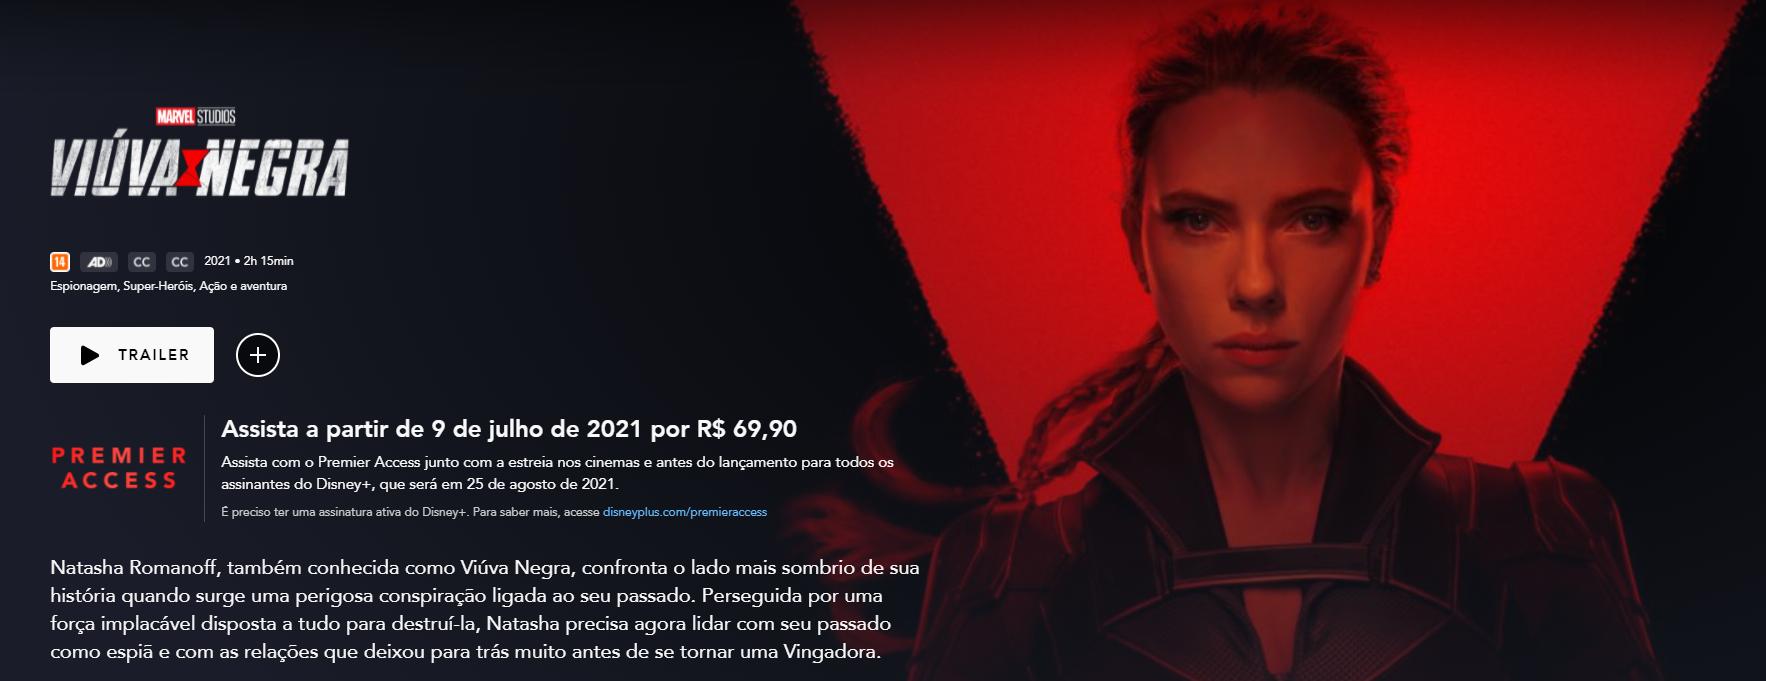 'Viúva Negra' custava R$ 69,90 no Premier Access (Crédito: reprodução / Disney+)